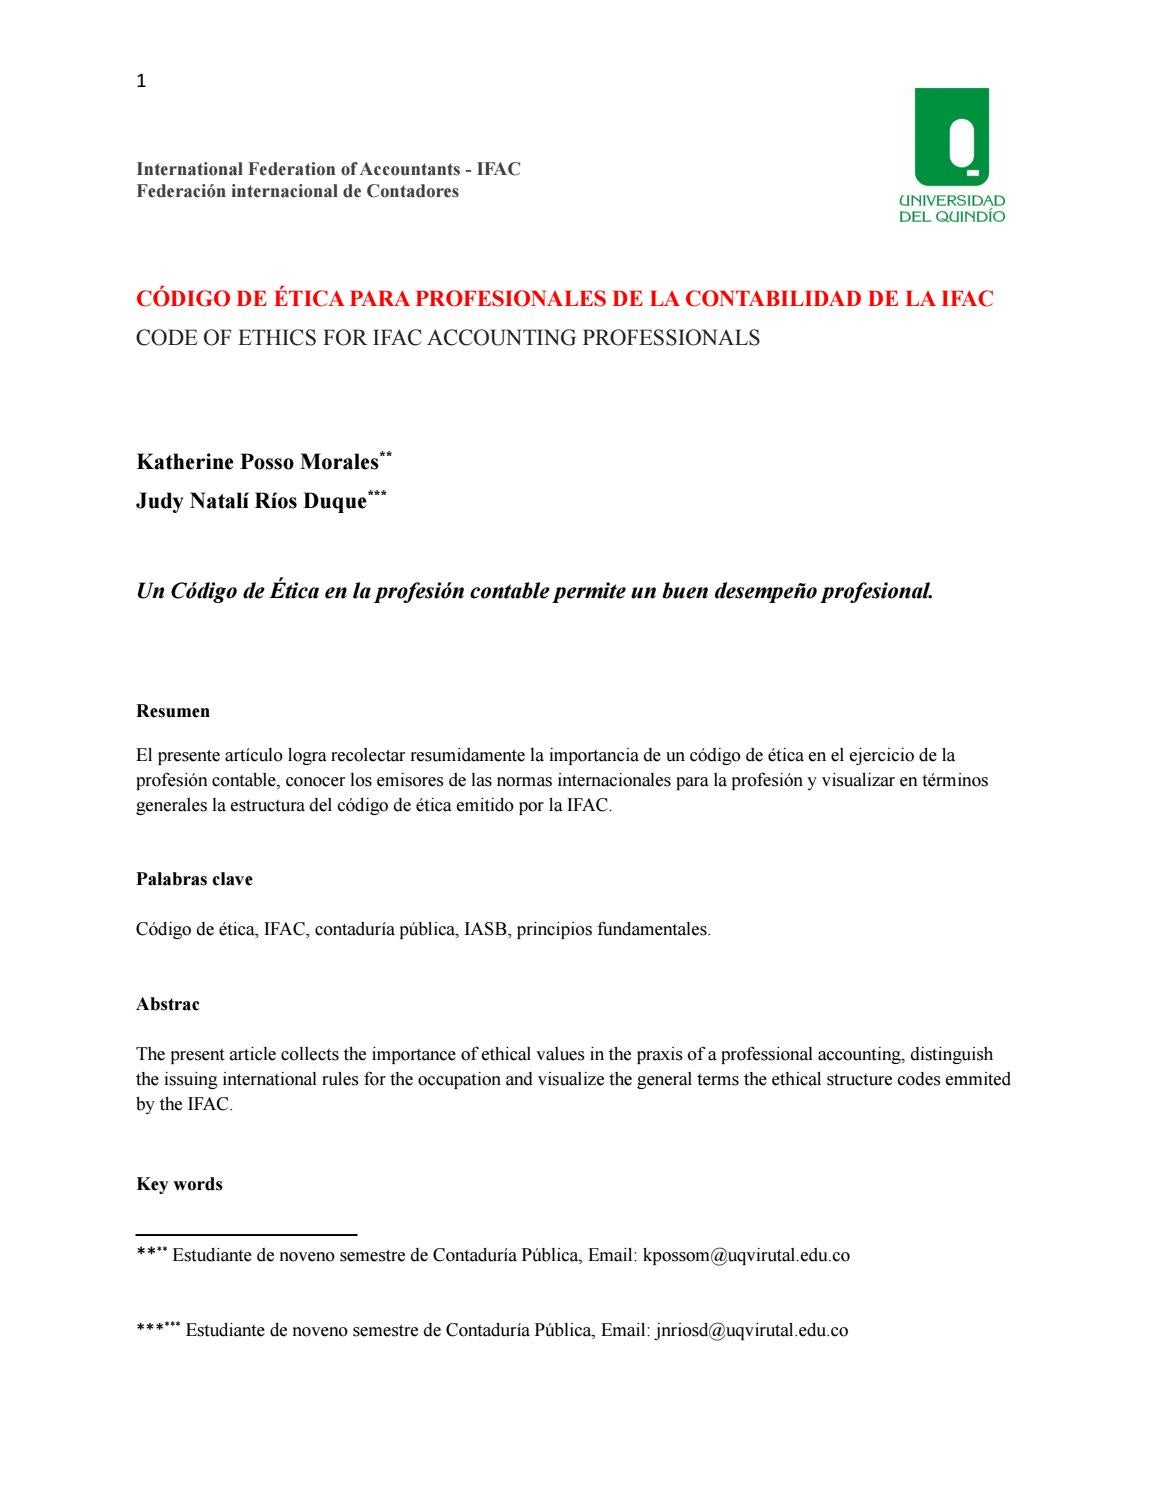 Código de ética ifac by JUDY NATALI RIOS DUQUE - issuu